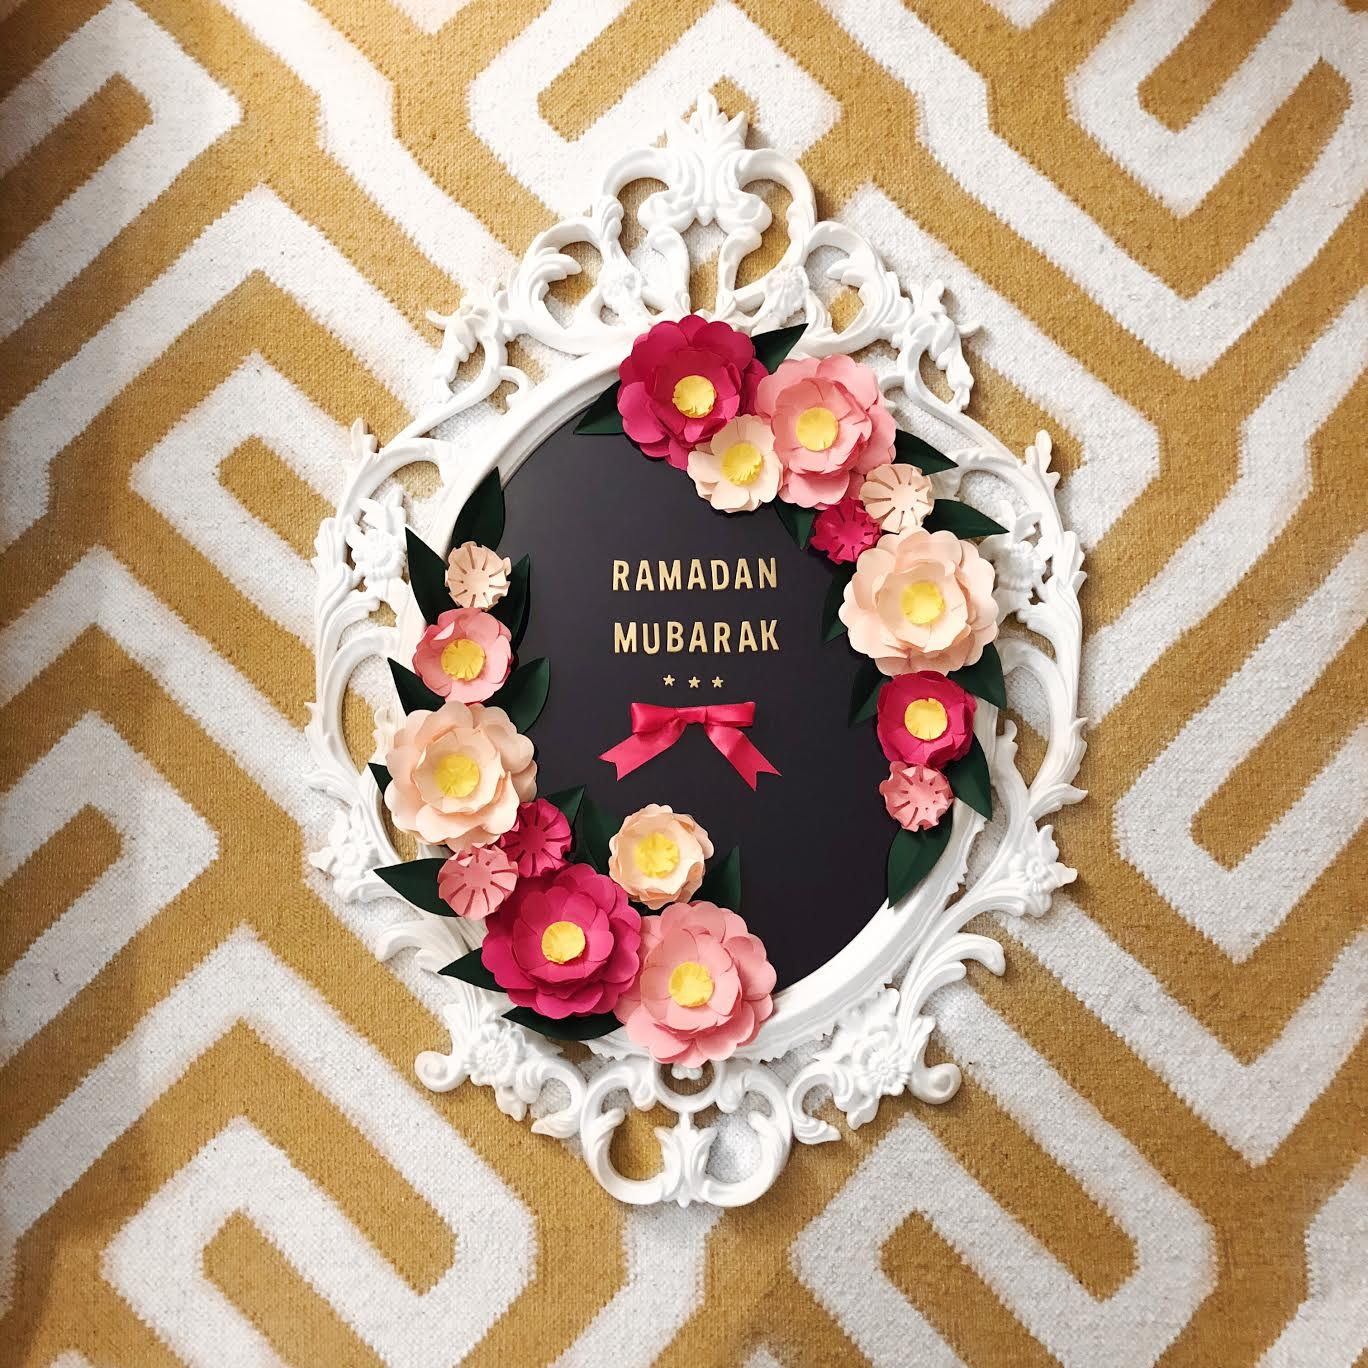 Modern-ramadan-decor-paper-wreath